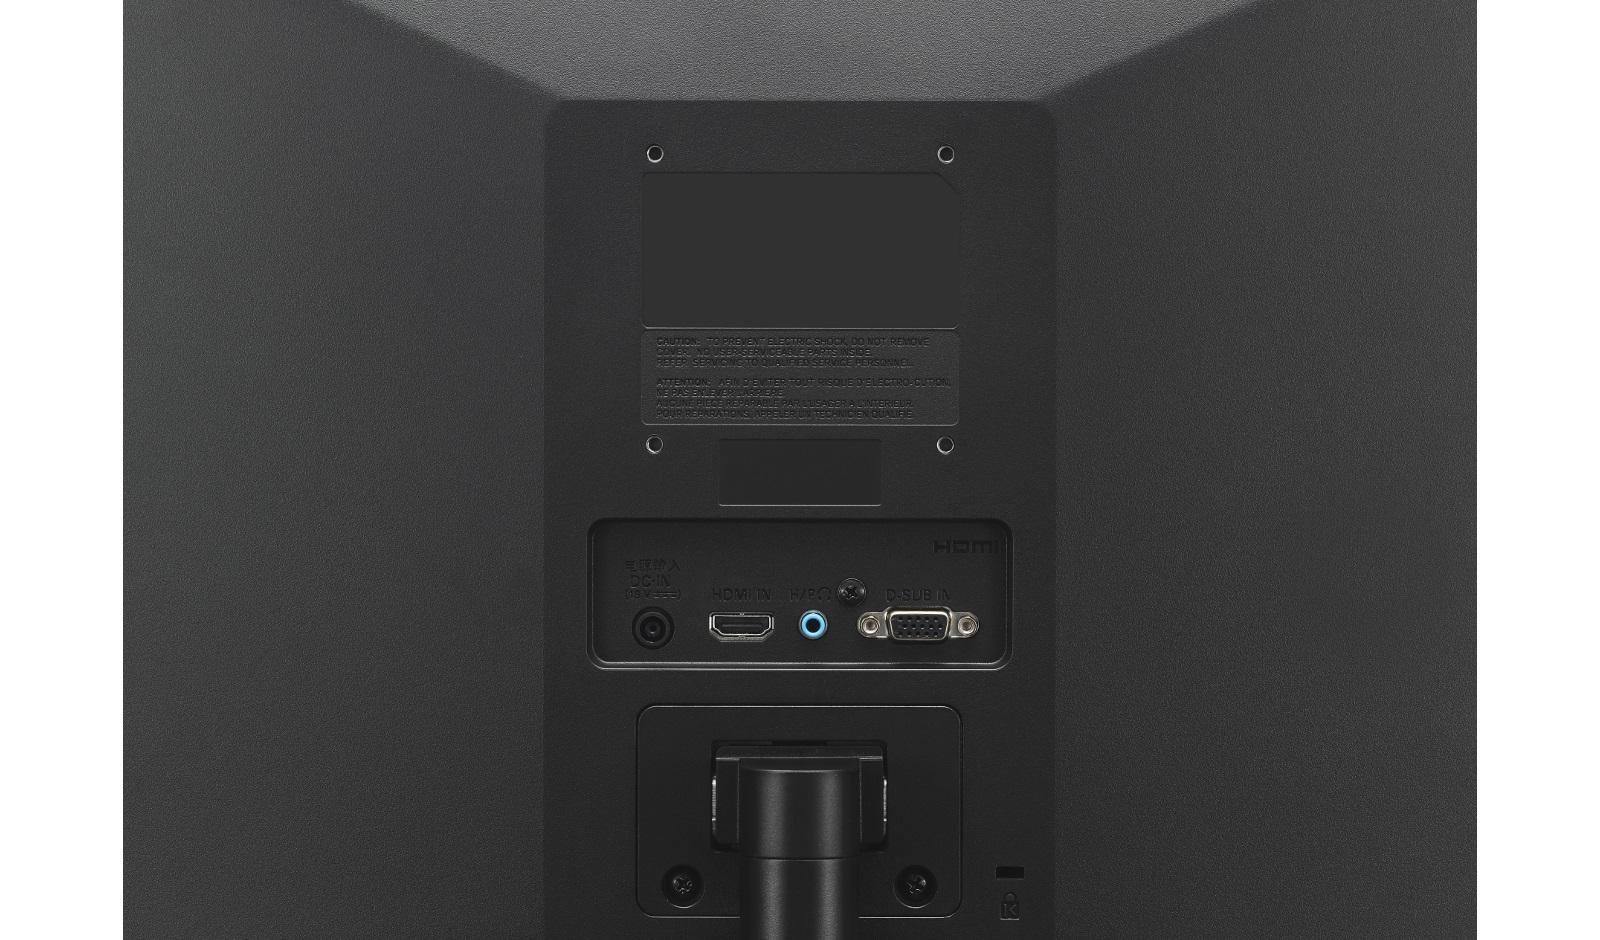 LG Monitor 24MK430H-B-B de 60,4 cm (23,8 pulgadas) 1920 x 1080 con panel IPS 16:9, A, 24MK430H-B